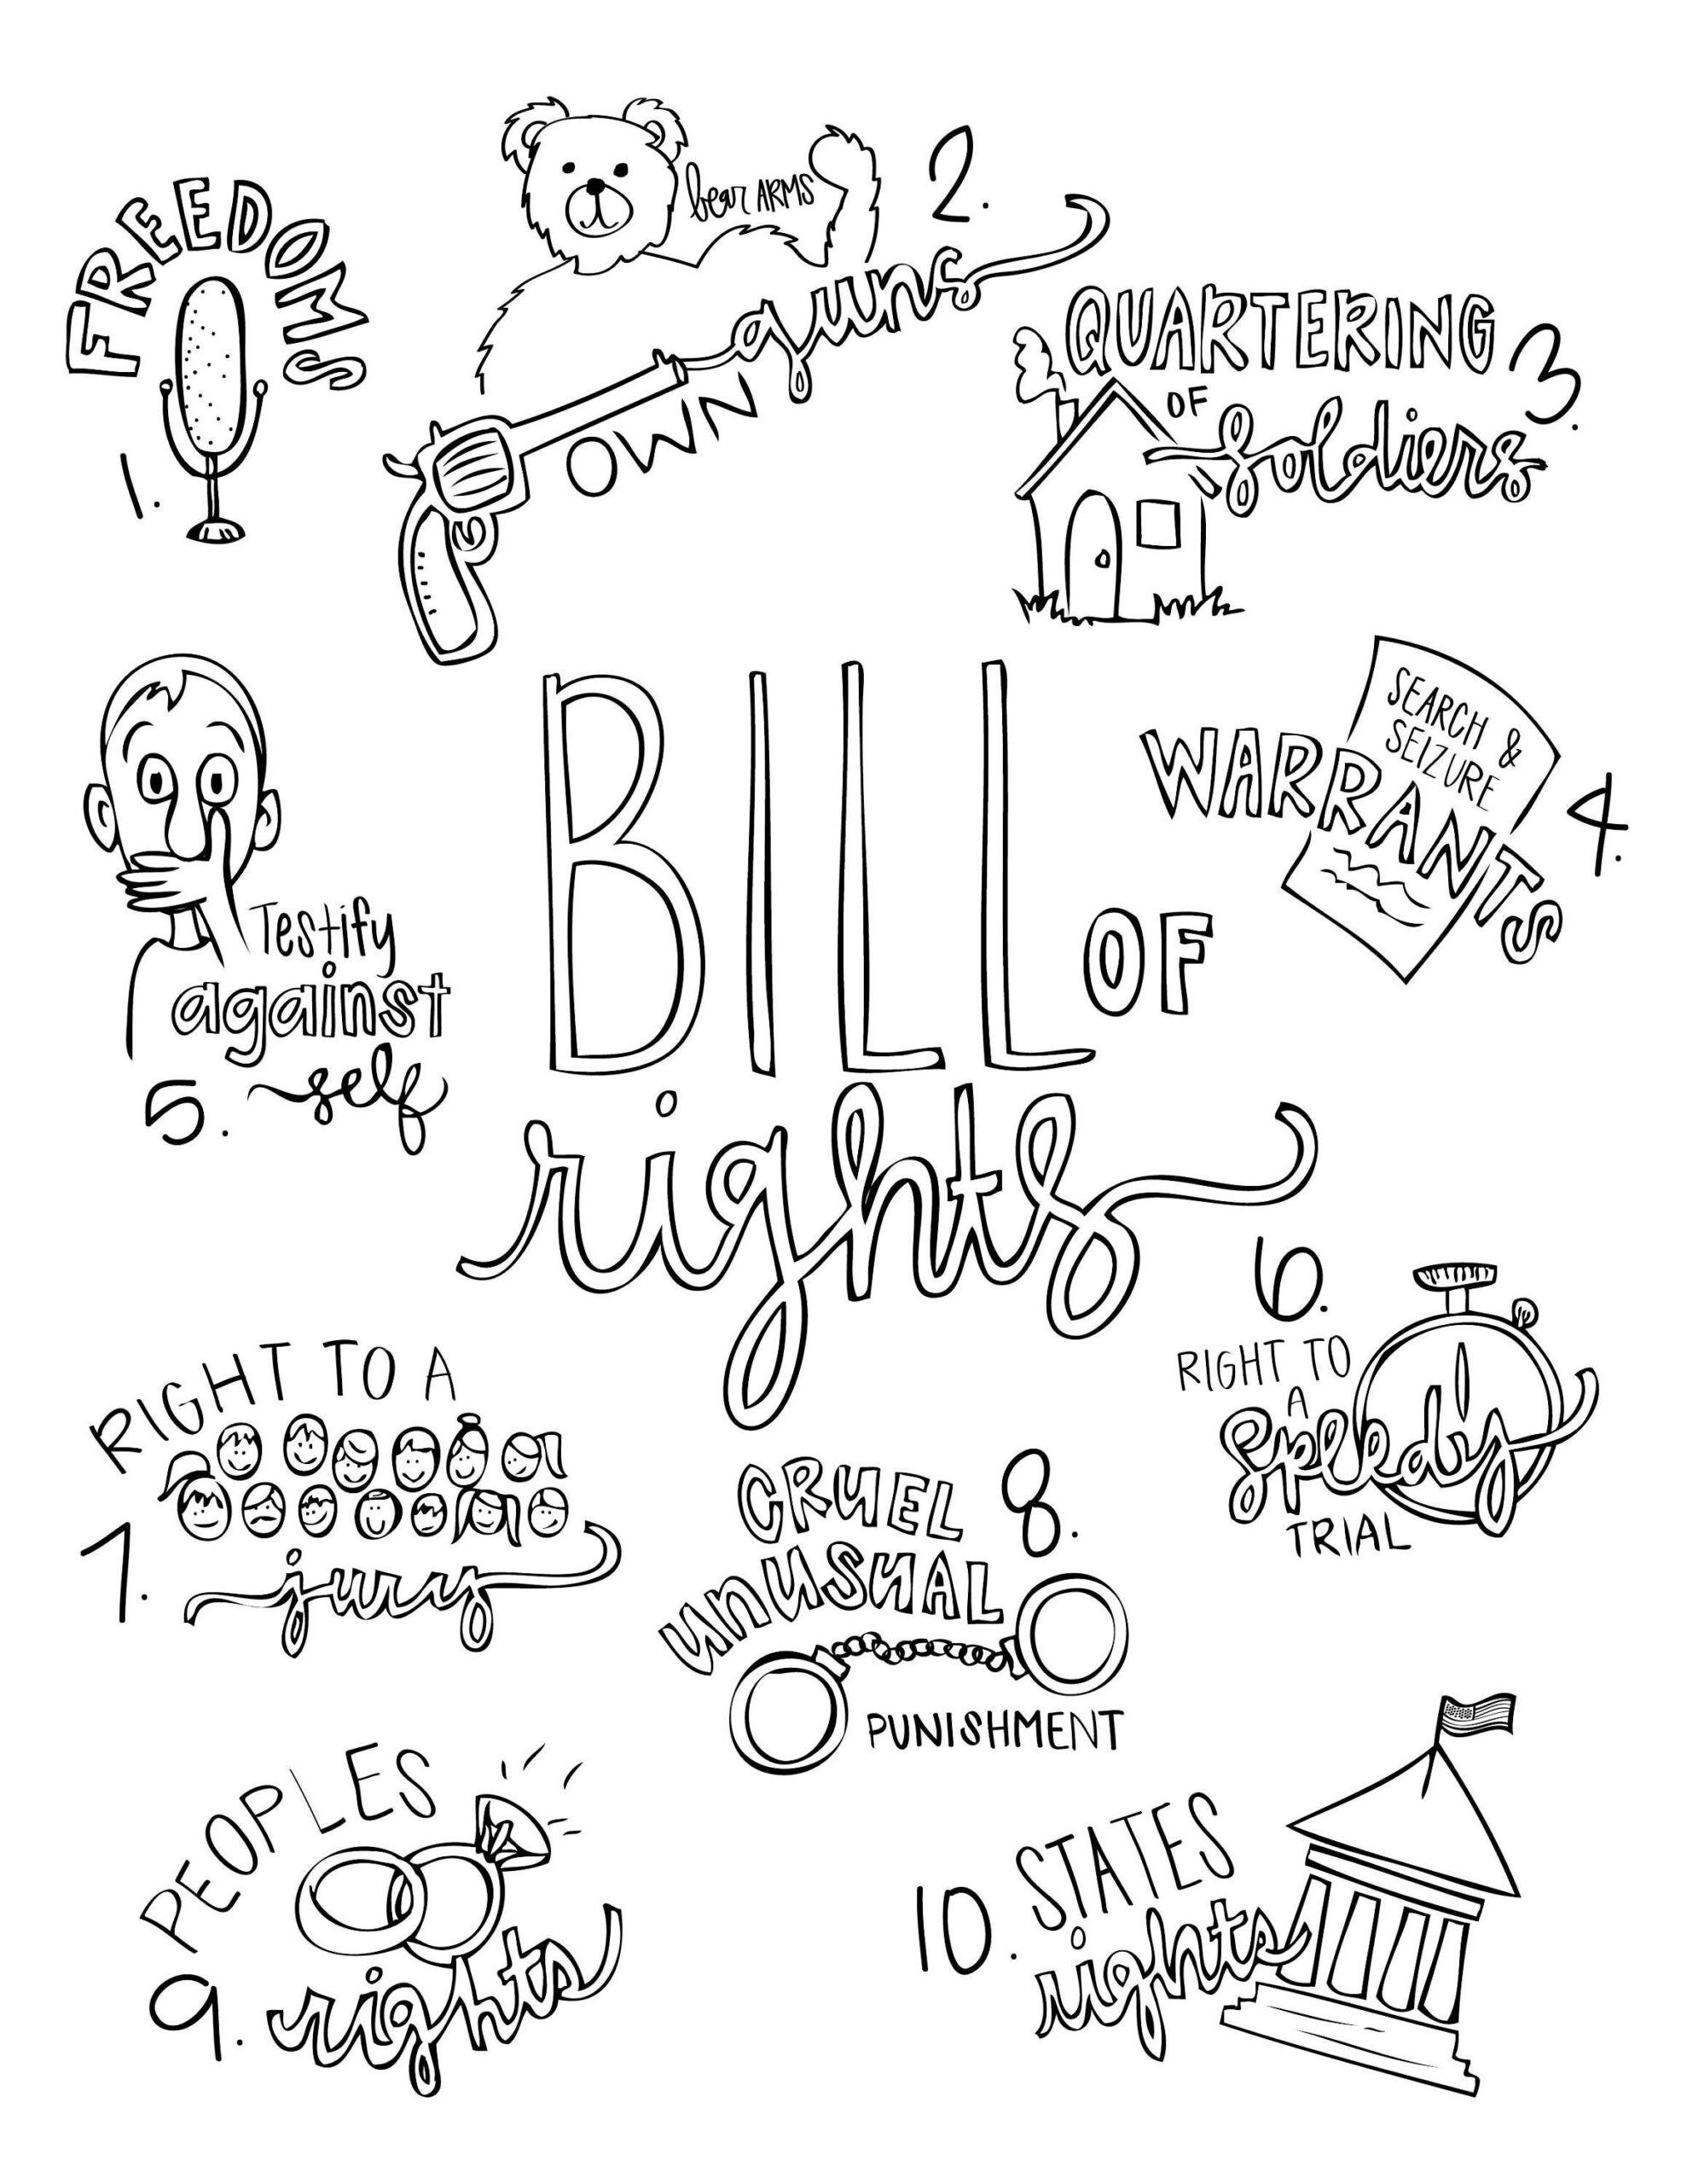 Bill Of Rights Worksheet Color the Preamble and Bill Of Rights – Kingandsullivan